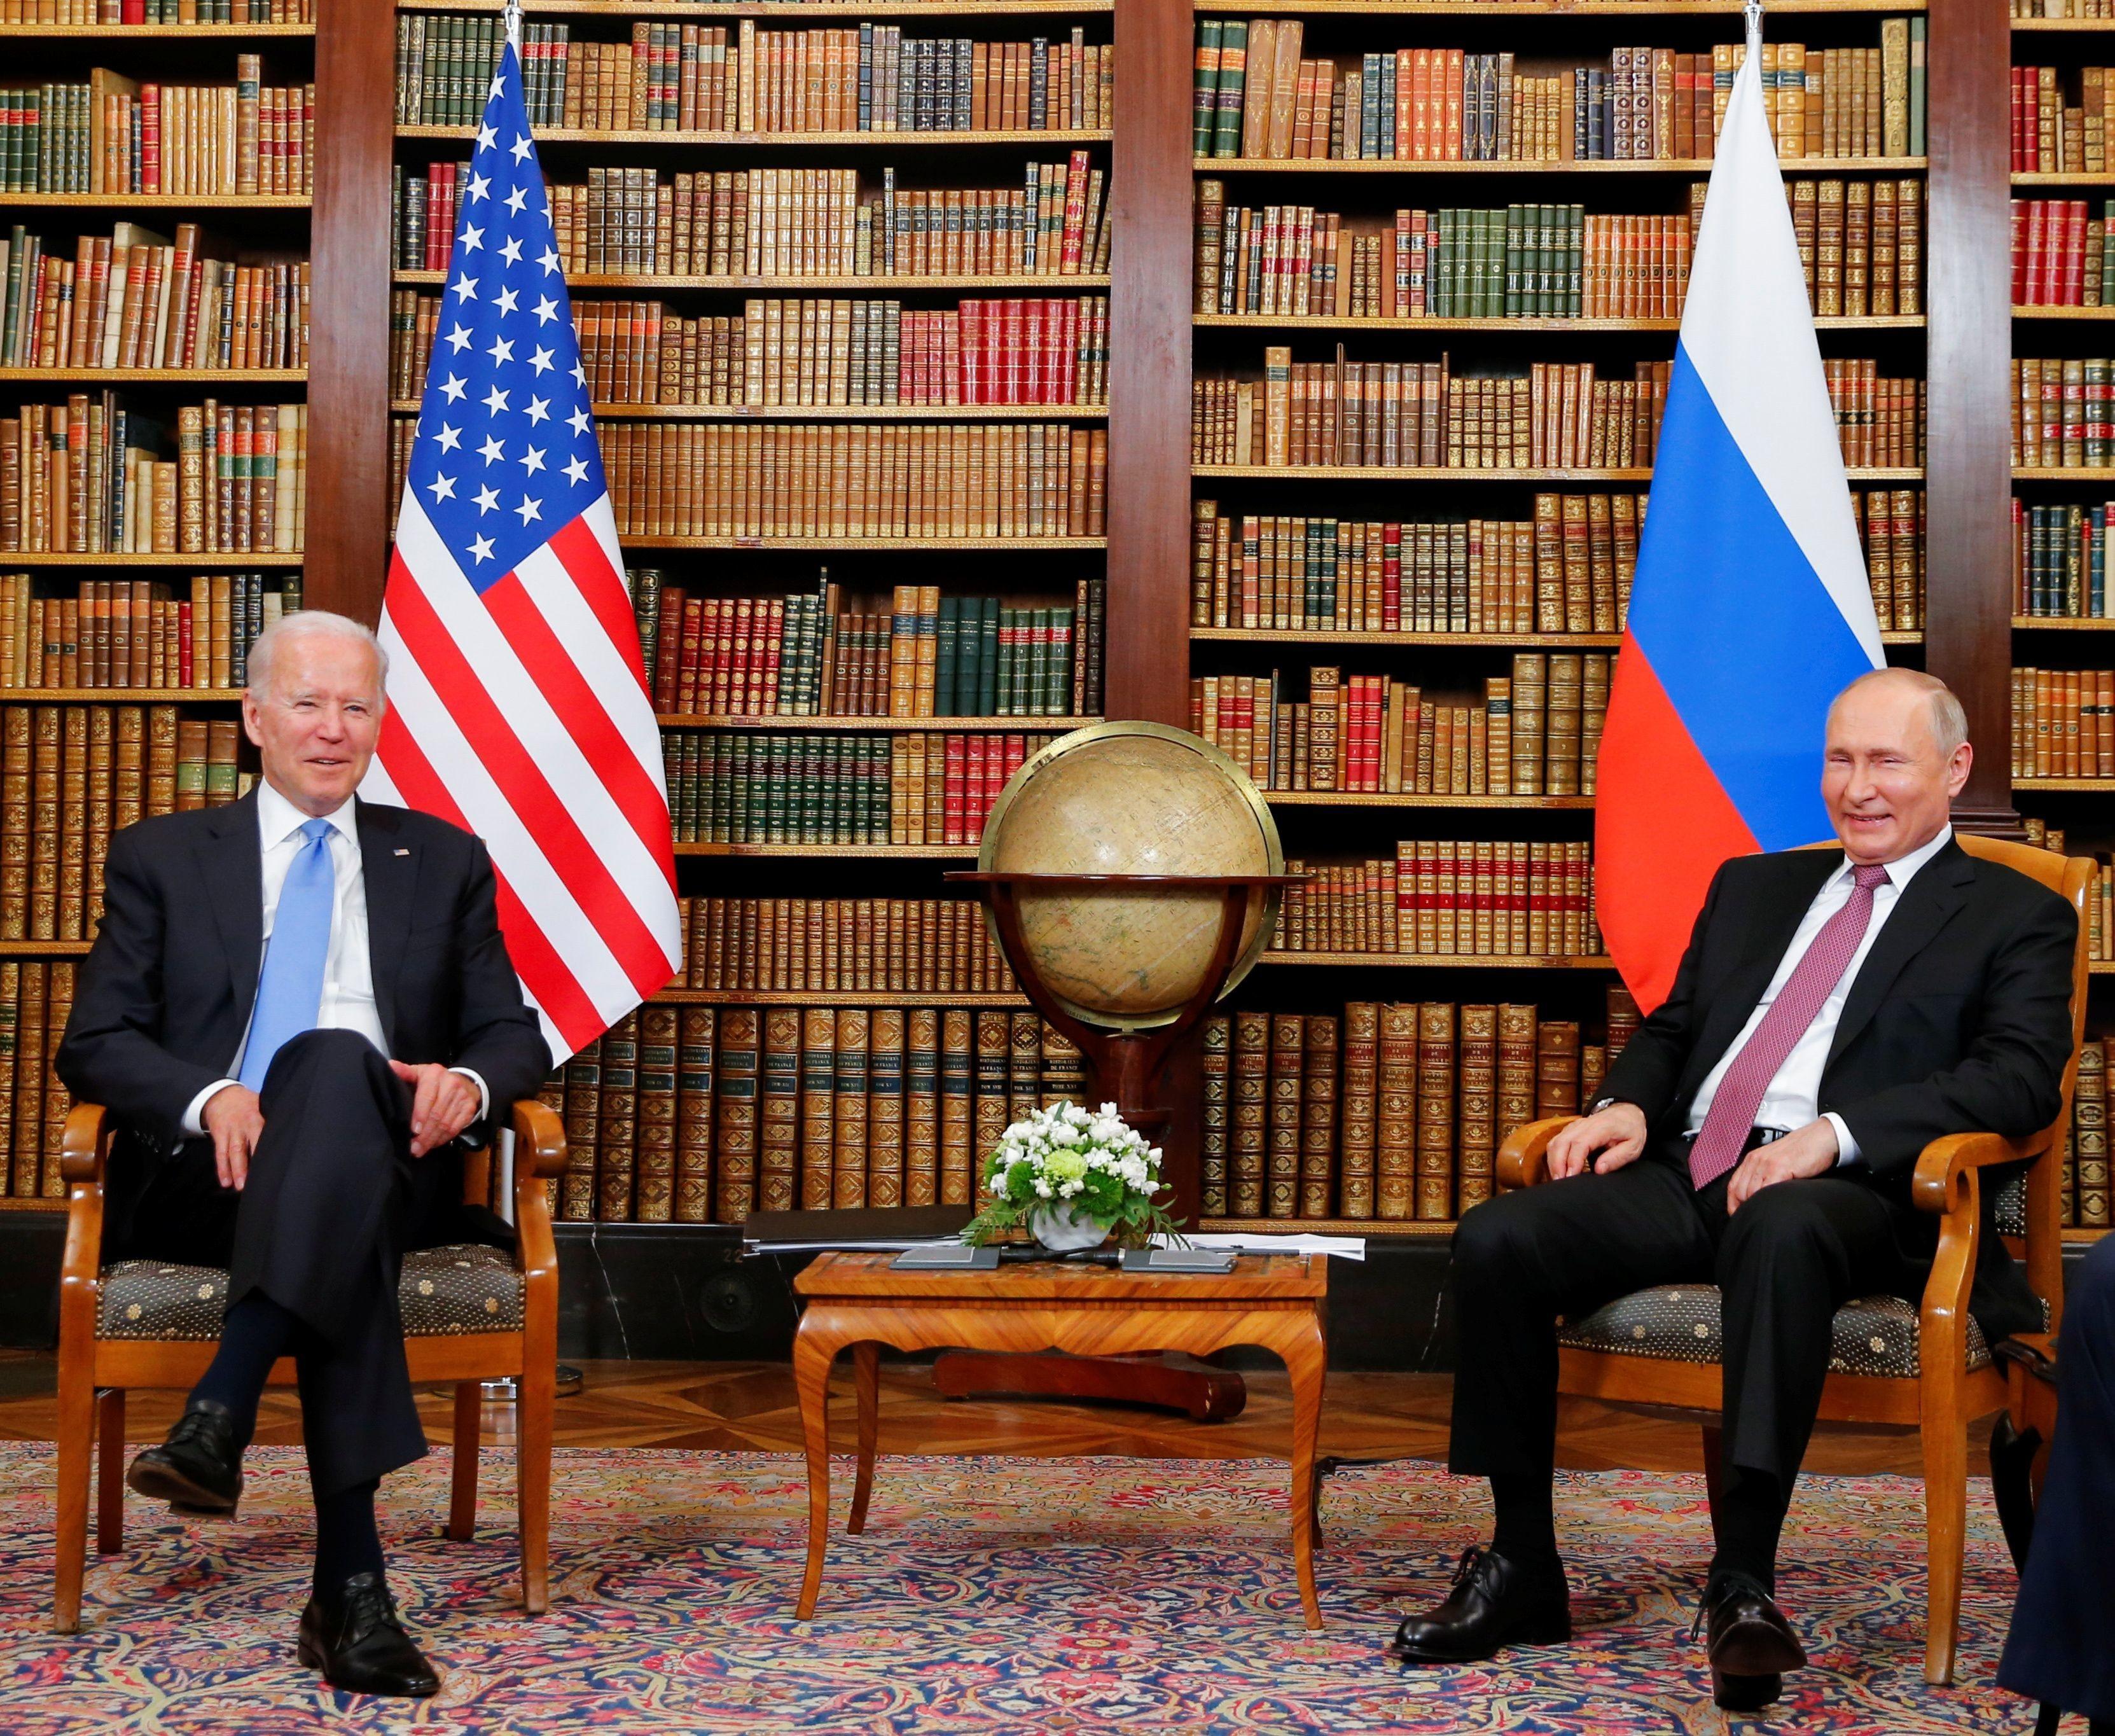 U.S. President Joe Biden and Russia's President Vladimir Putin meet for the U.S.-Russia summit at Villa La Grange in Geneva, Switzerland, June 16, 2021. REUTERS/Denis Balibouse/Pool - RC2P1O939N7T